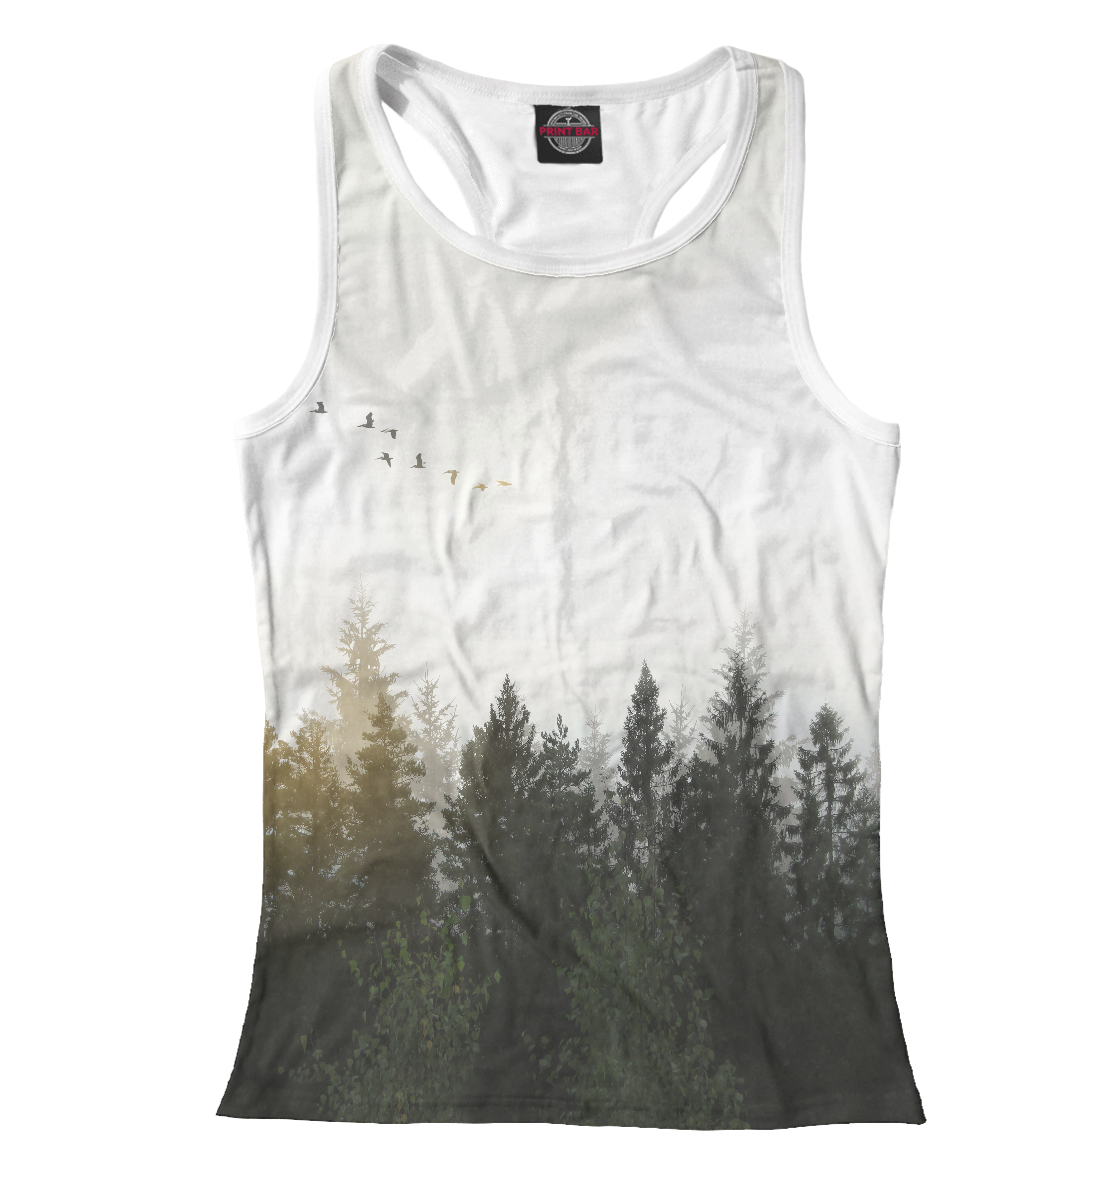 Купить Лесной пейзаж, Printbar, Майки борцовки, PEY-328282-mayb-1